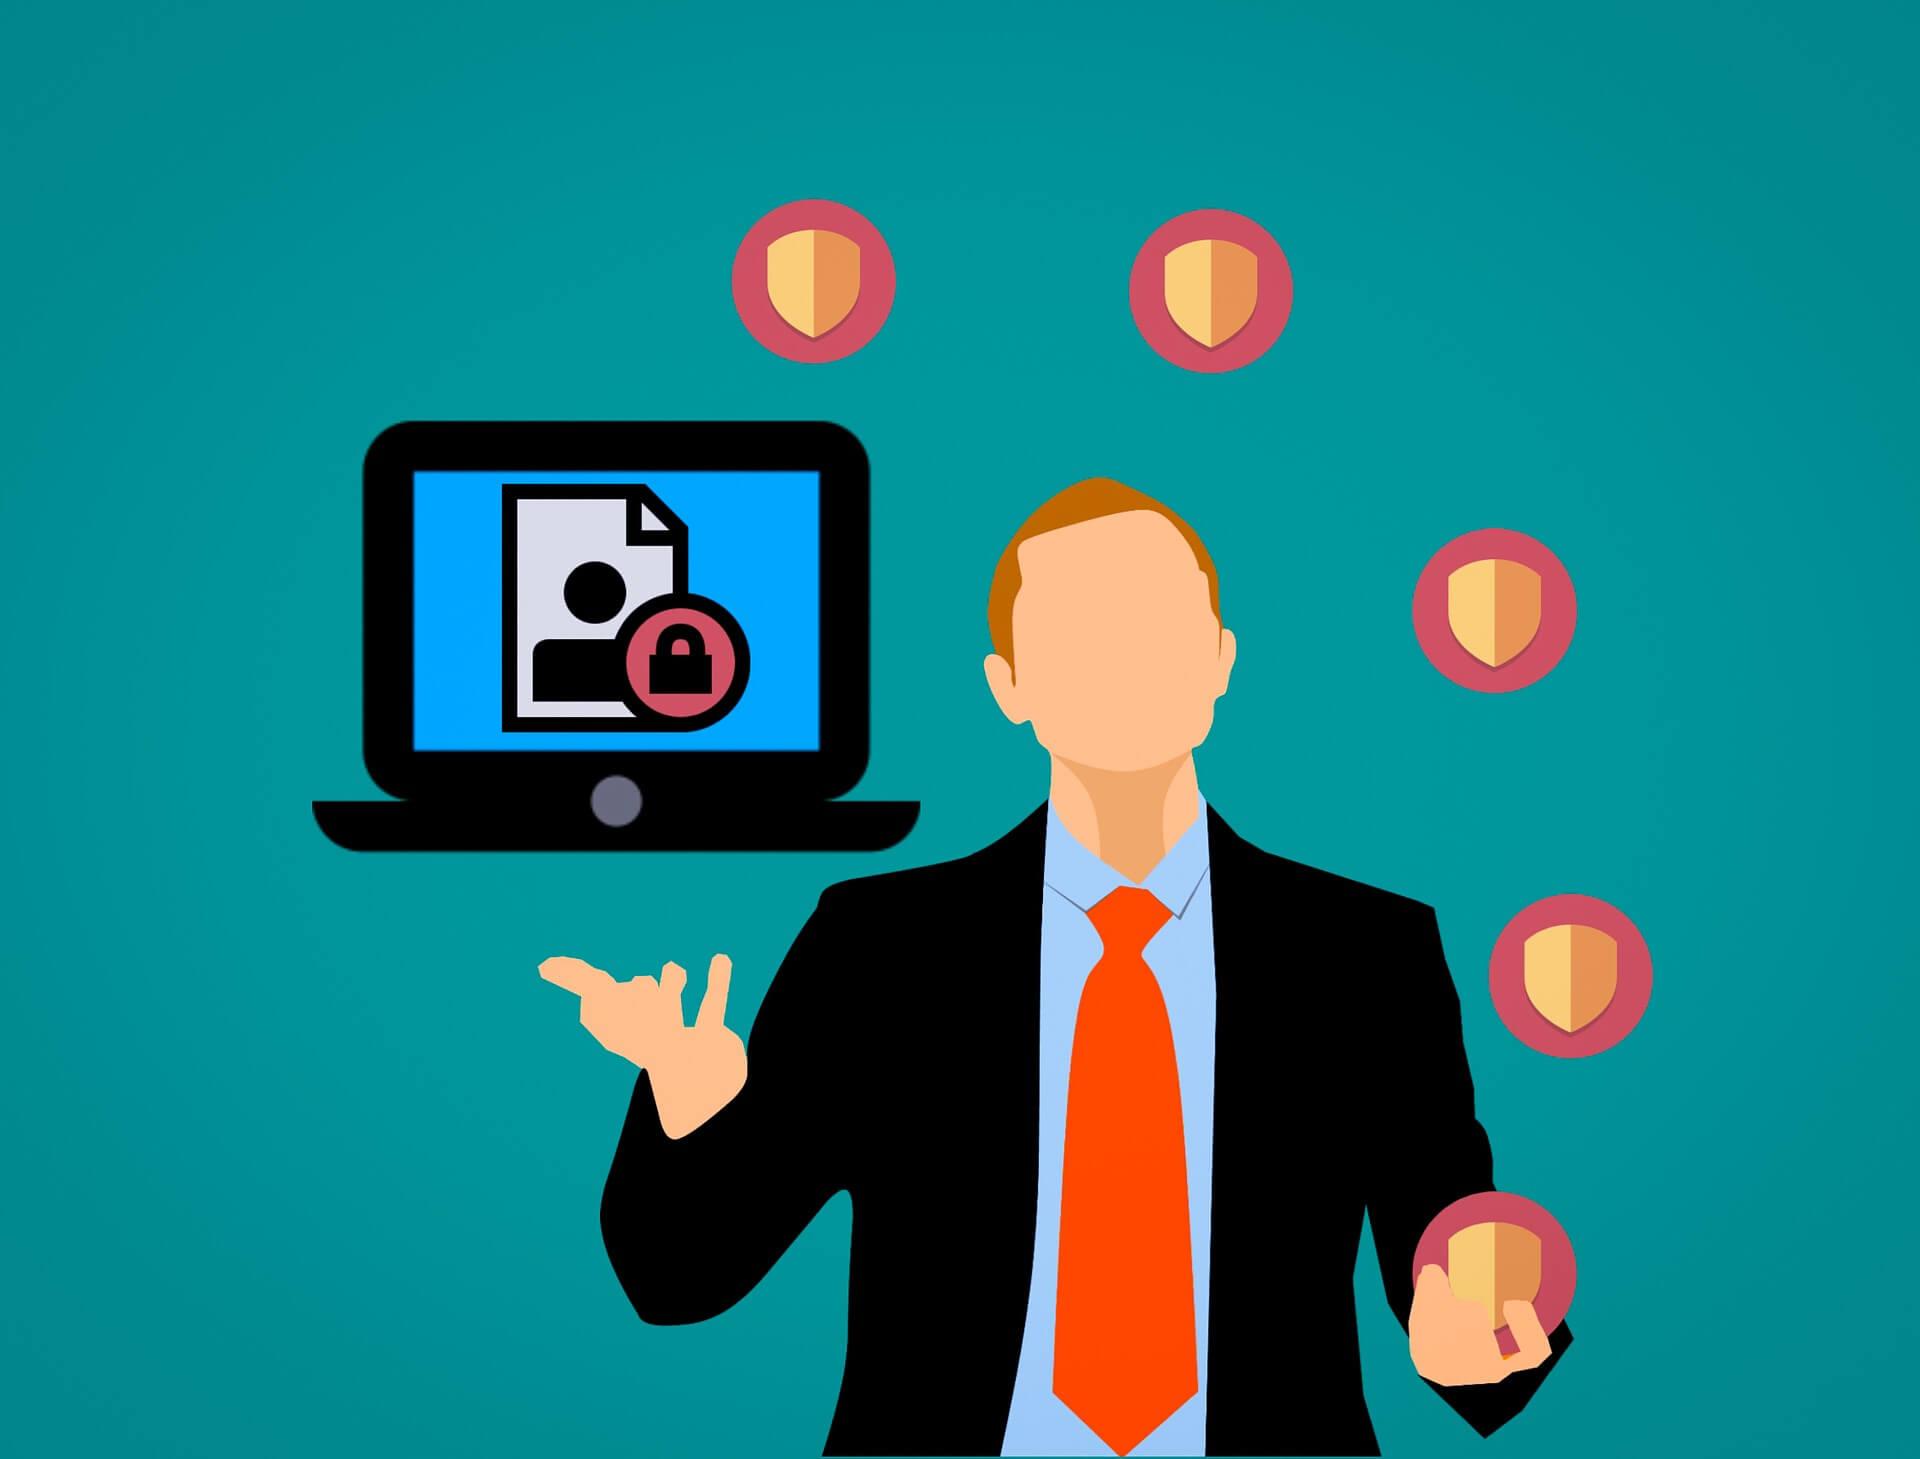 General Data Protection Regulation Summary